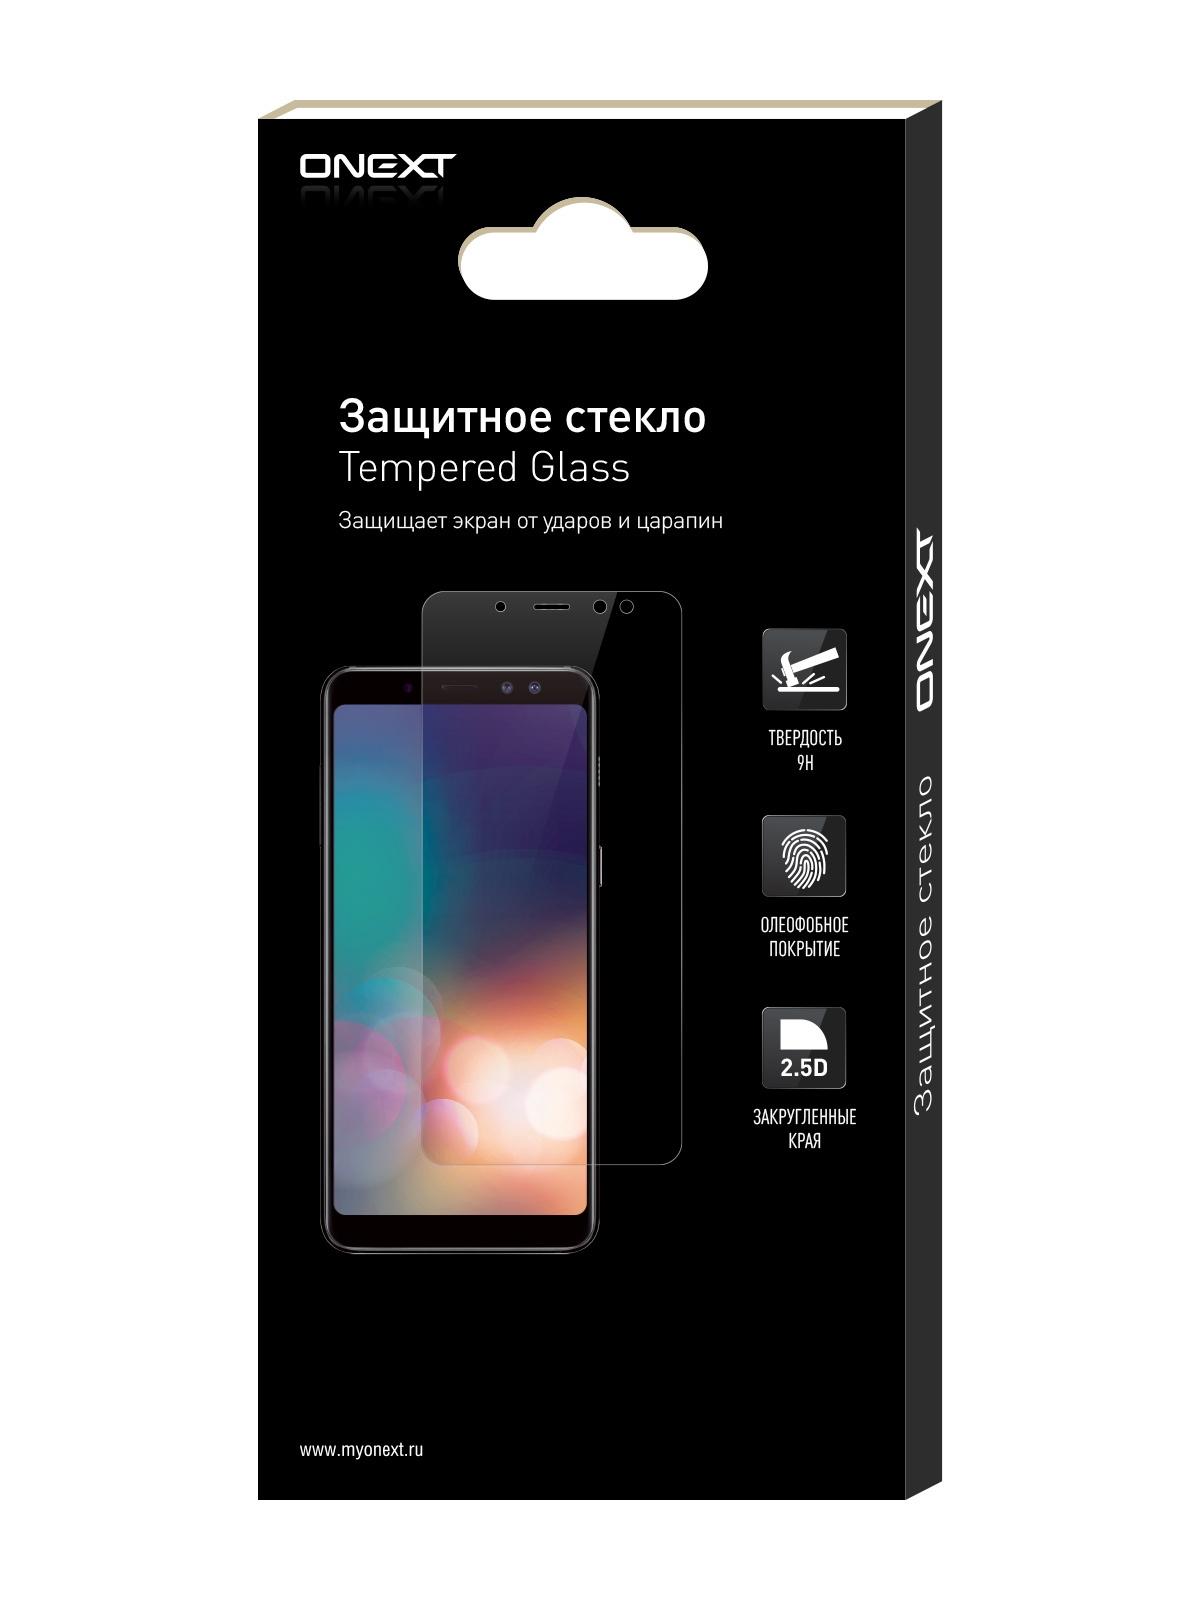 Защитное стекло ONEXT Huawei P10 Plus защитное стекло onext для huawei p10 lite 641 41432 с рамкой белый